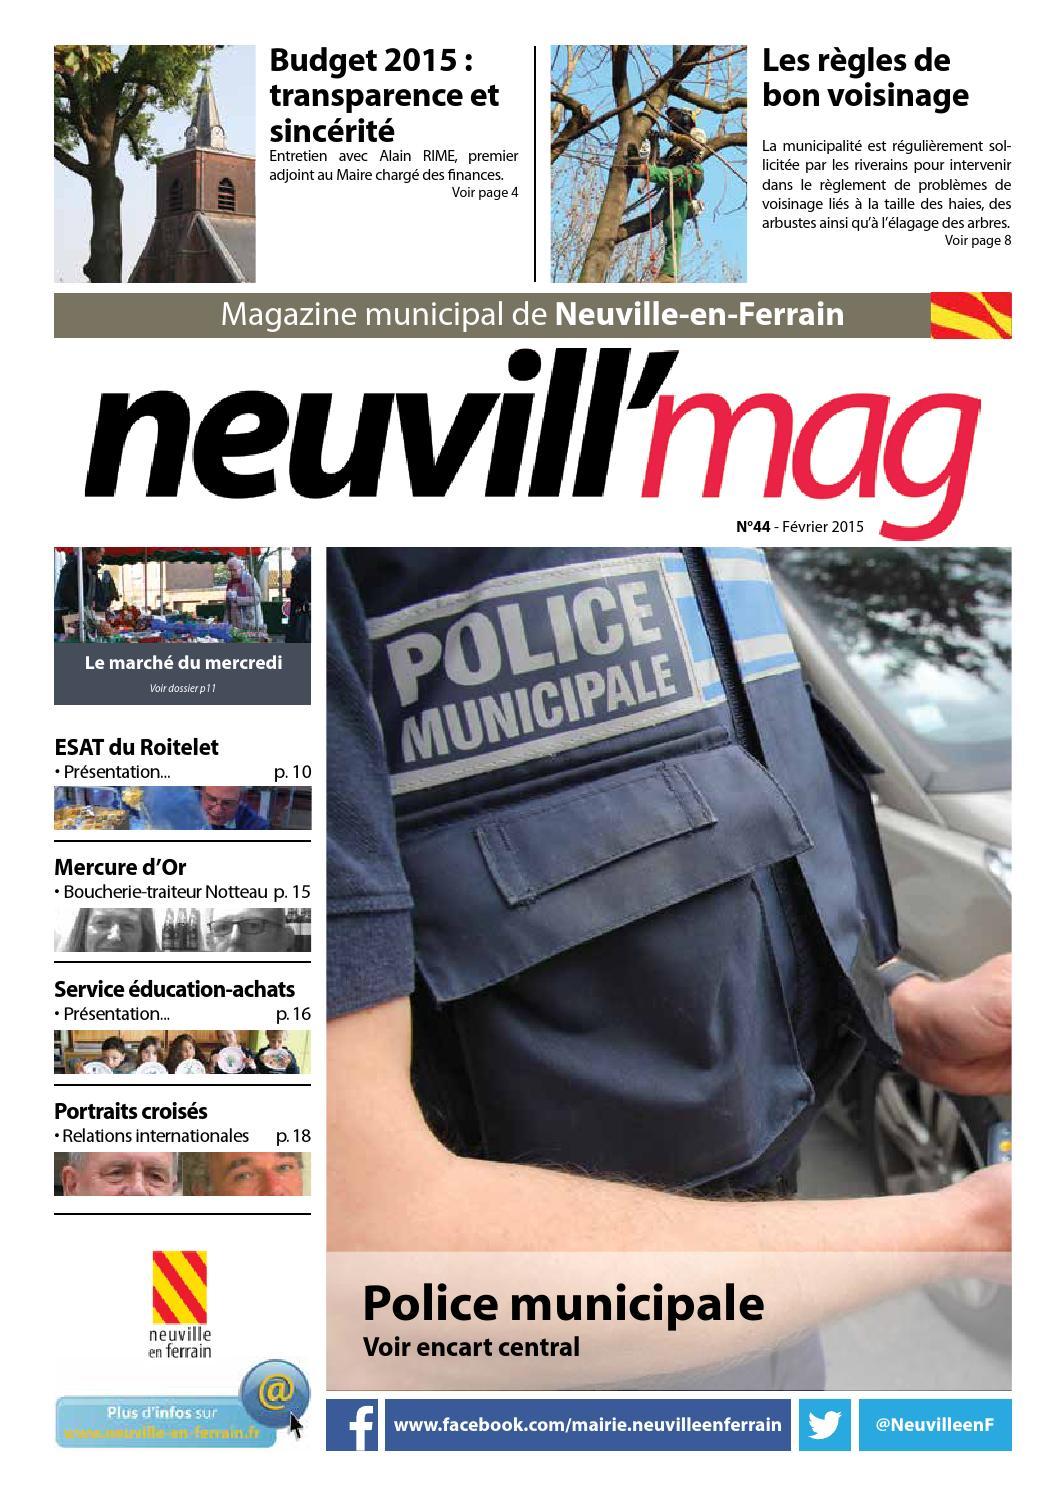 neuvill 39 mag n 44 by mairie de neuville en ferrain issuu. Black Bedroom Furniture Sets. Home Design Ideas